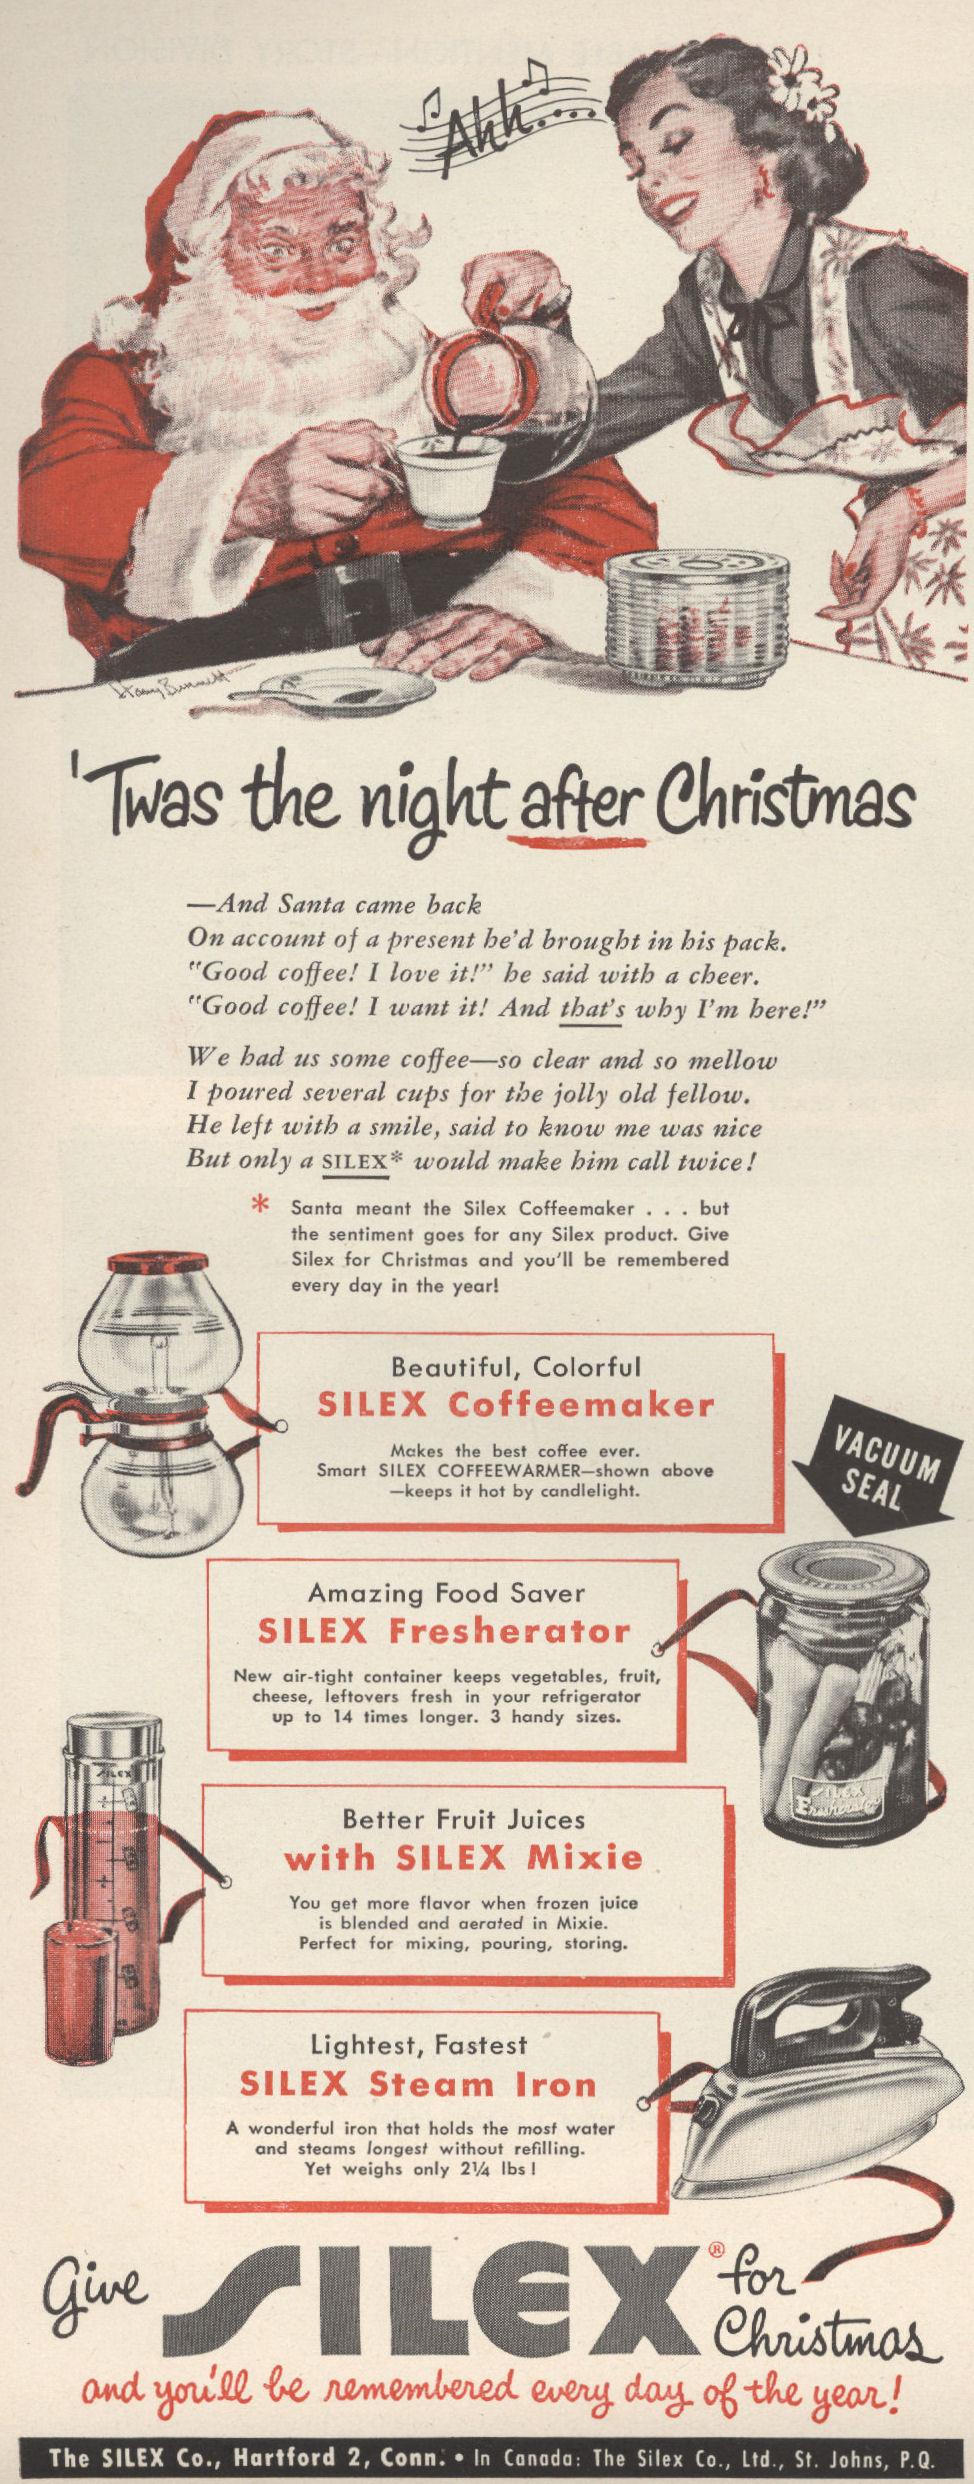 Life Nov 51 Silex Santa Master